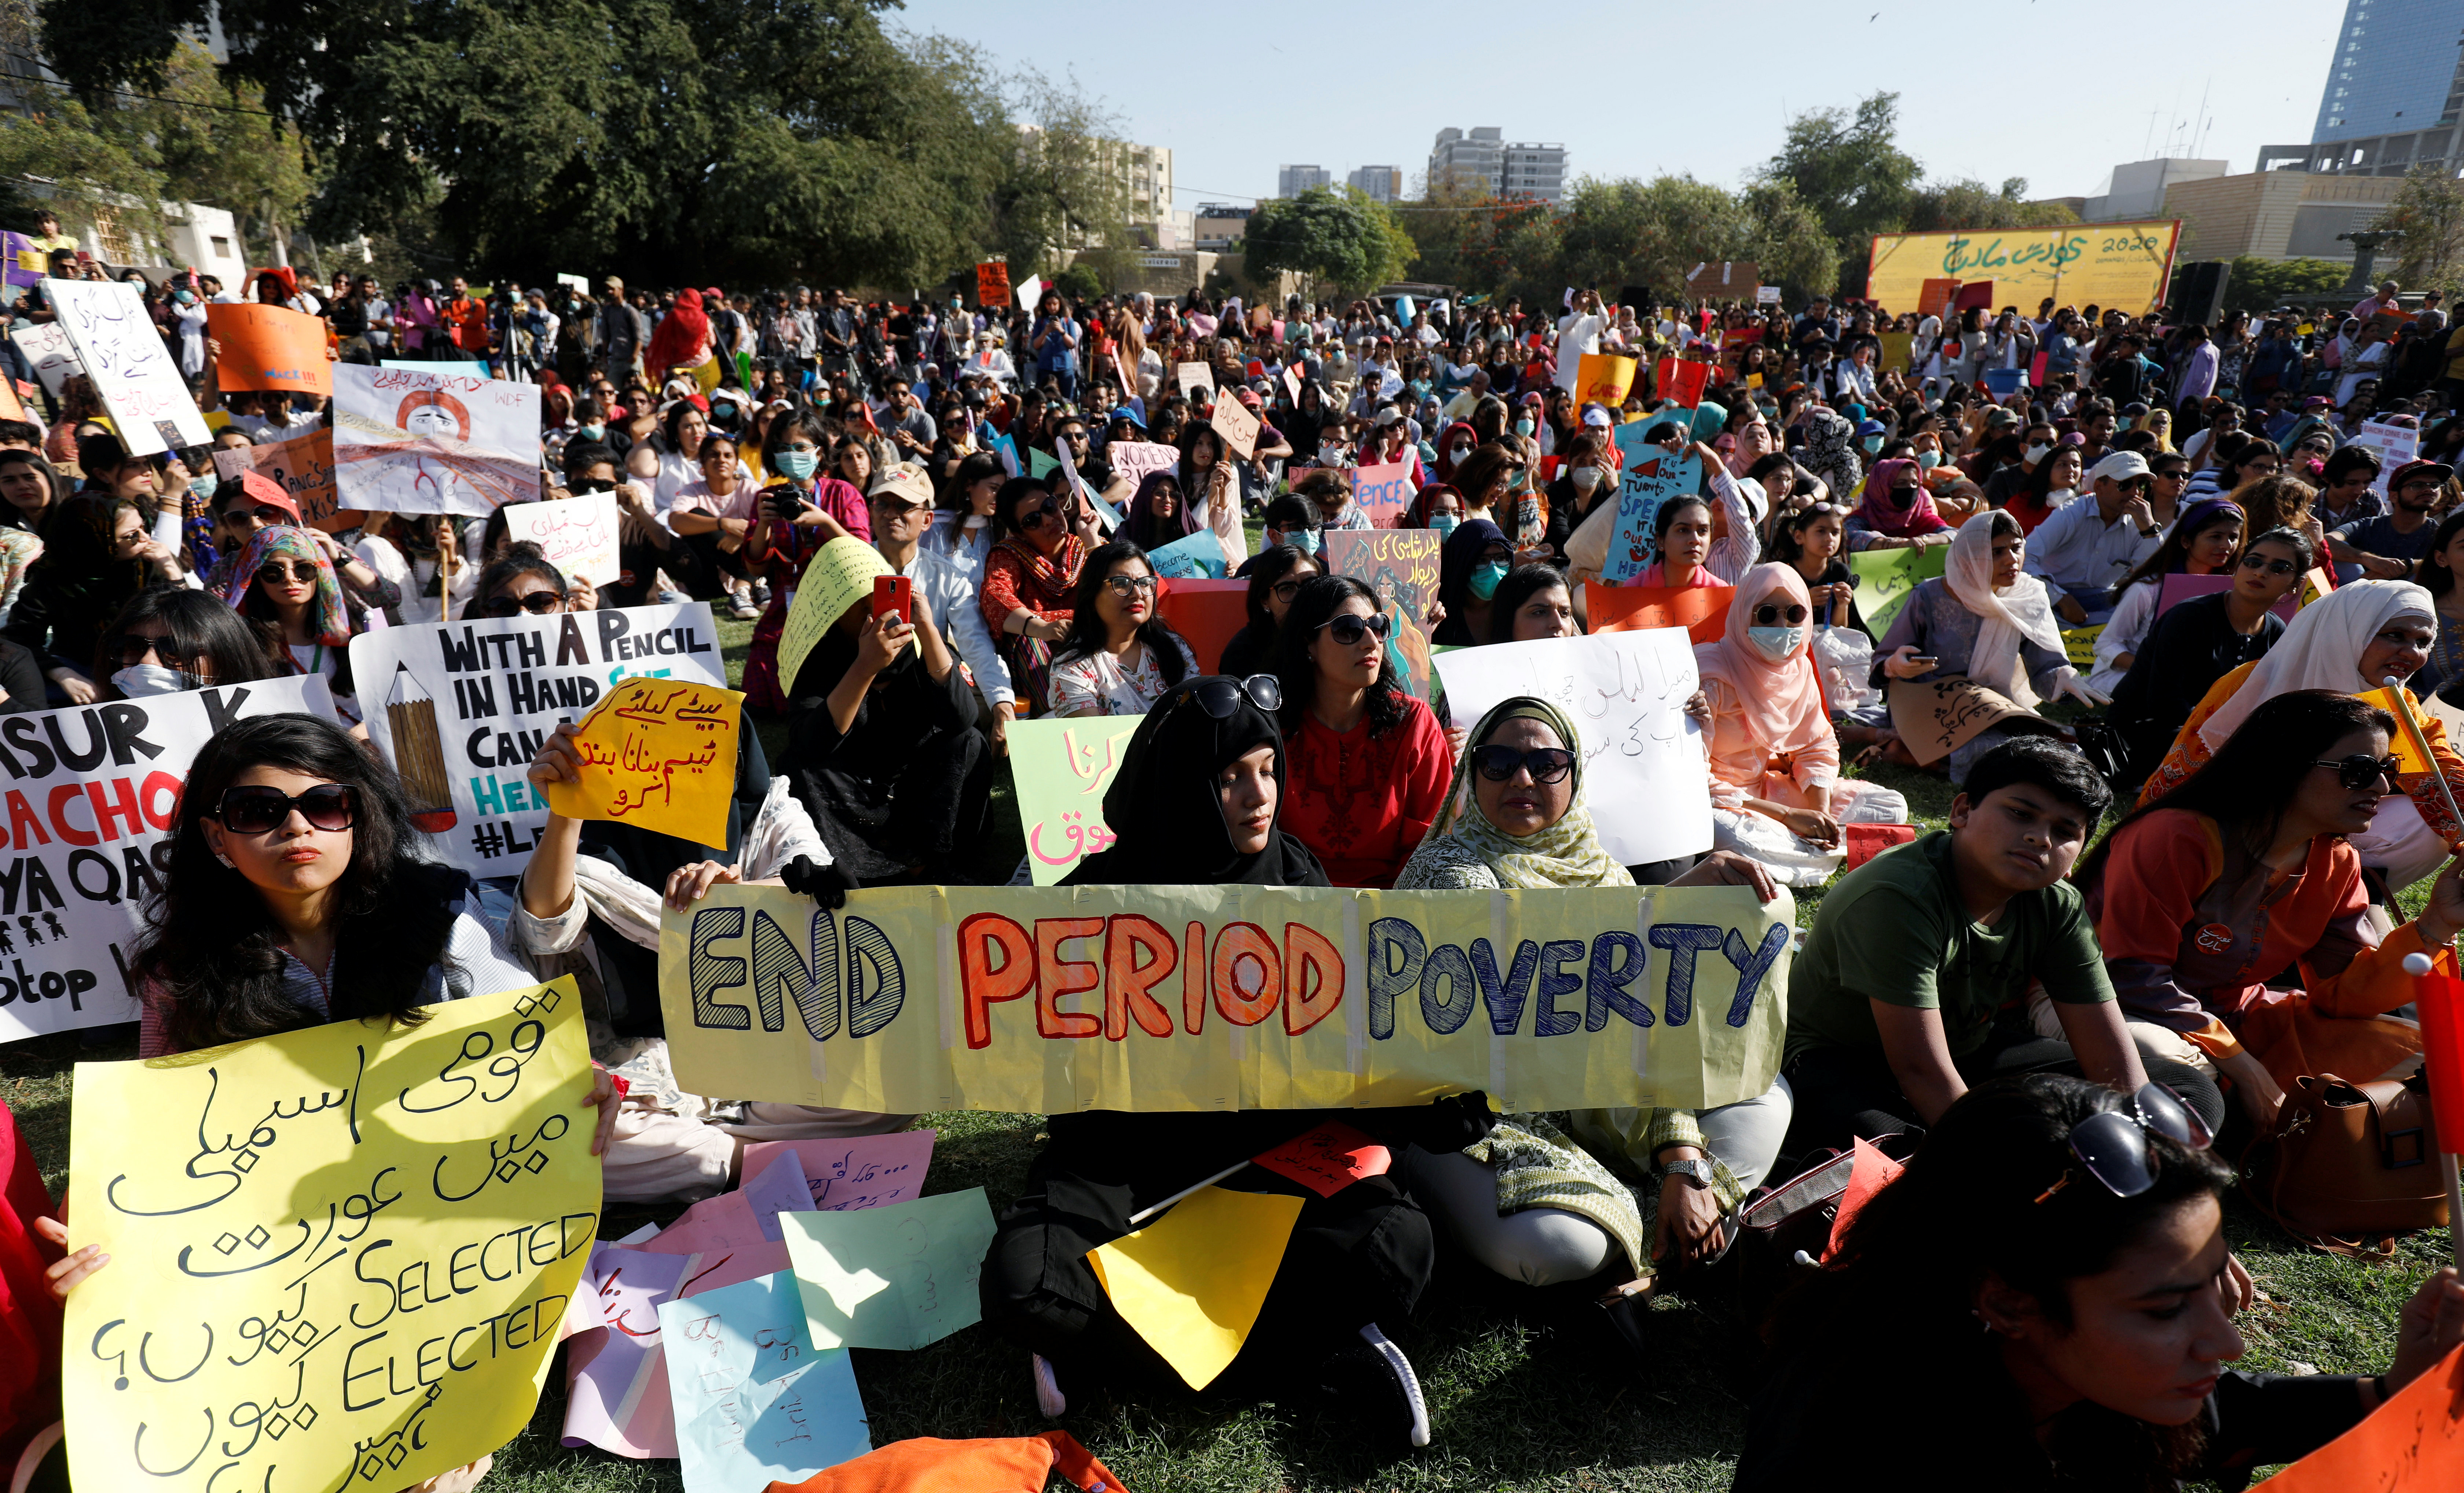 La marcha en Karachi, Pakistan (REUTERS/Akhtar Soomro)